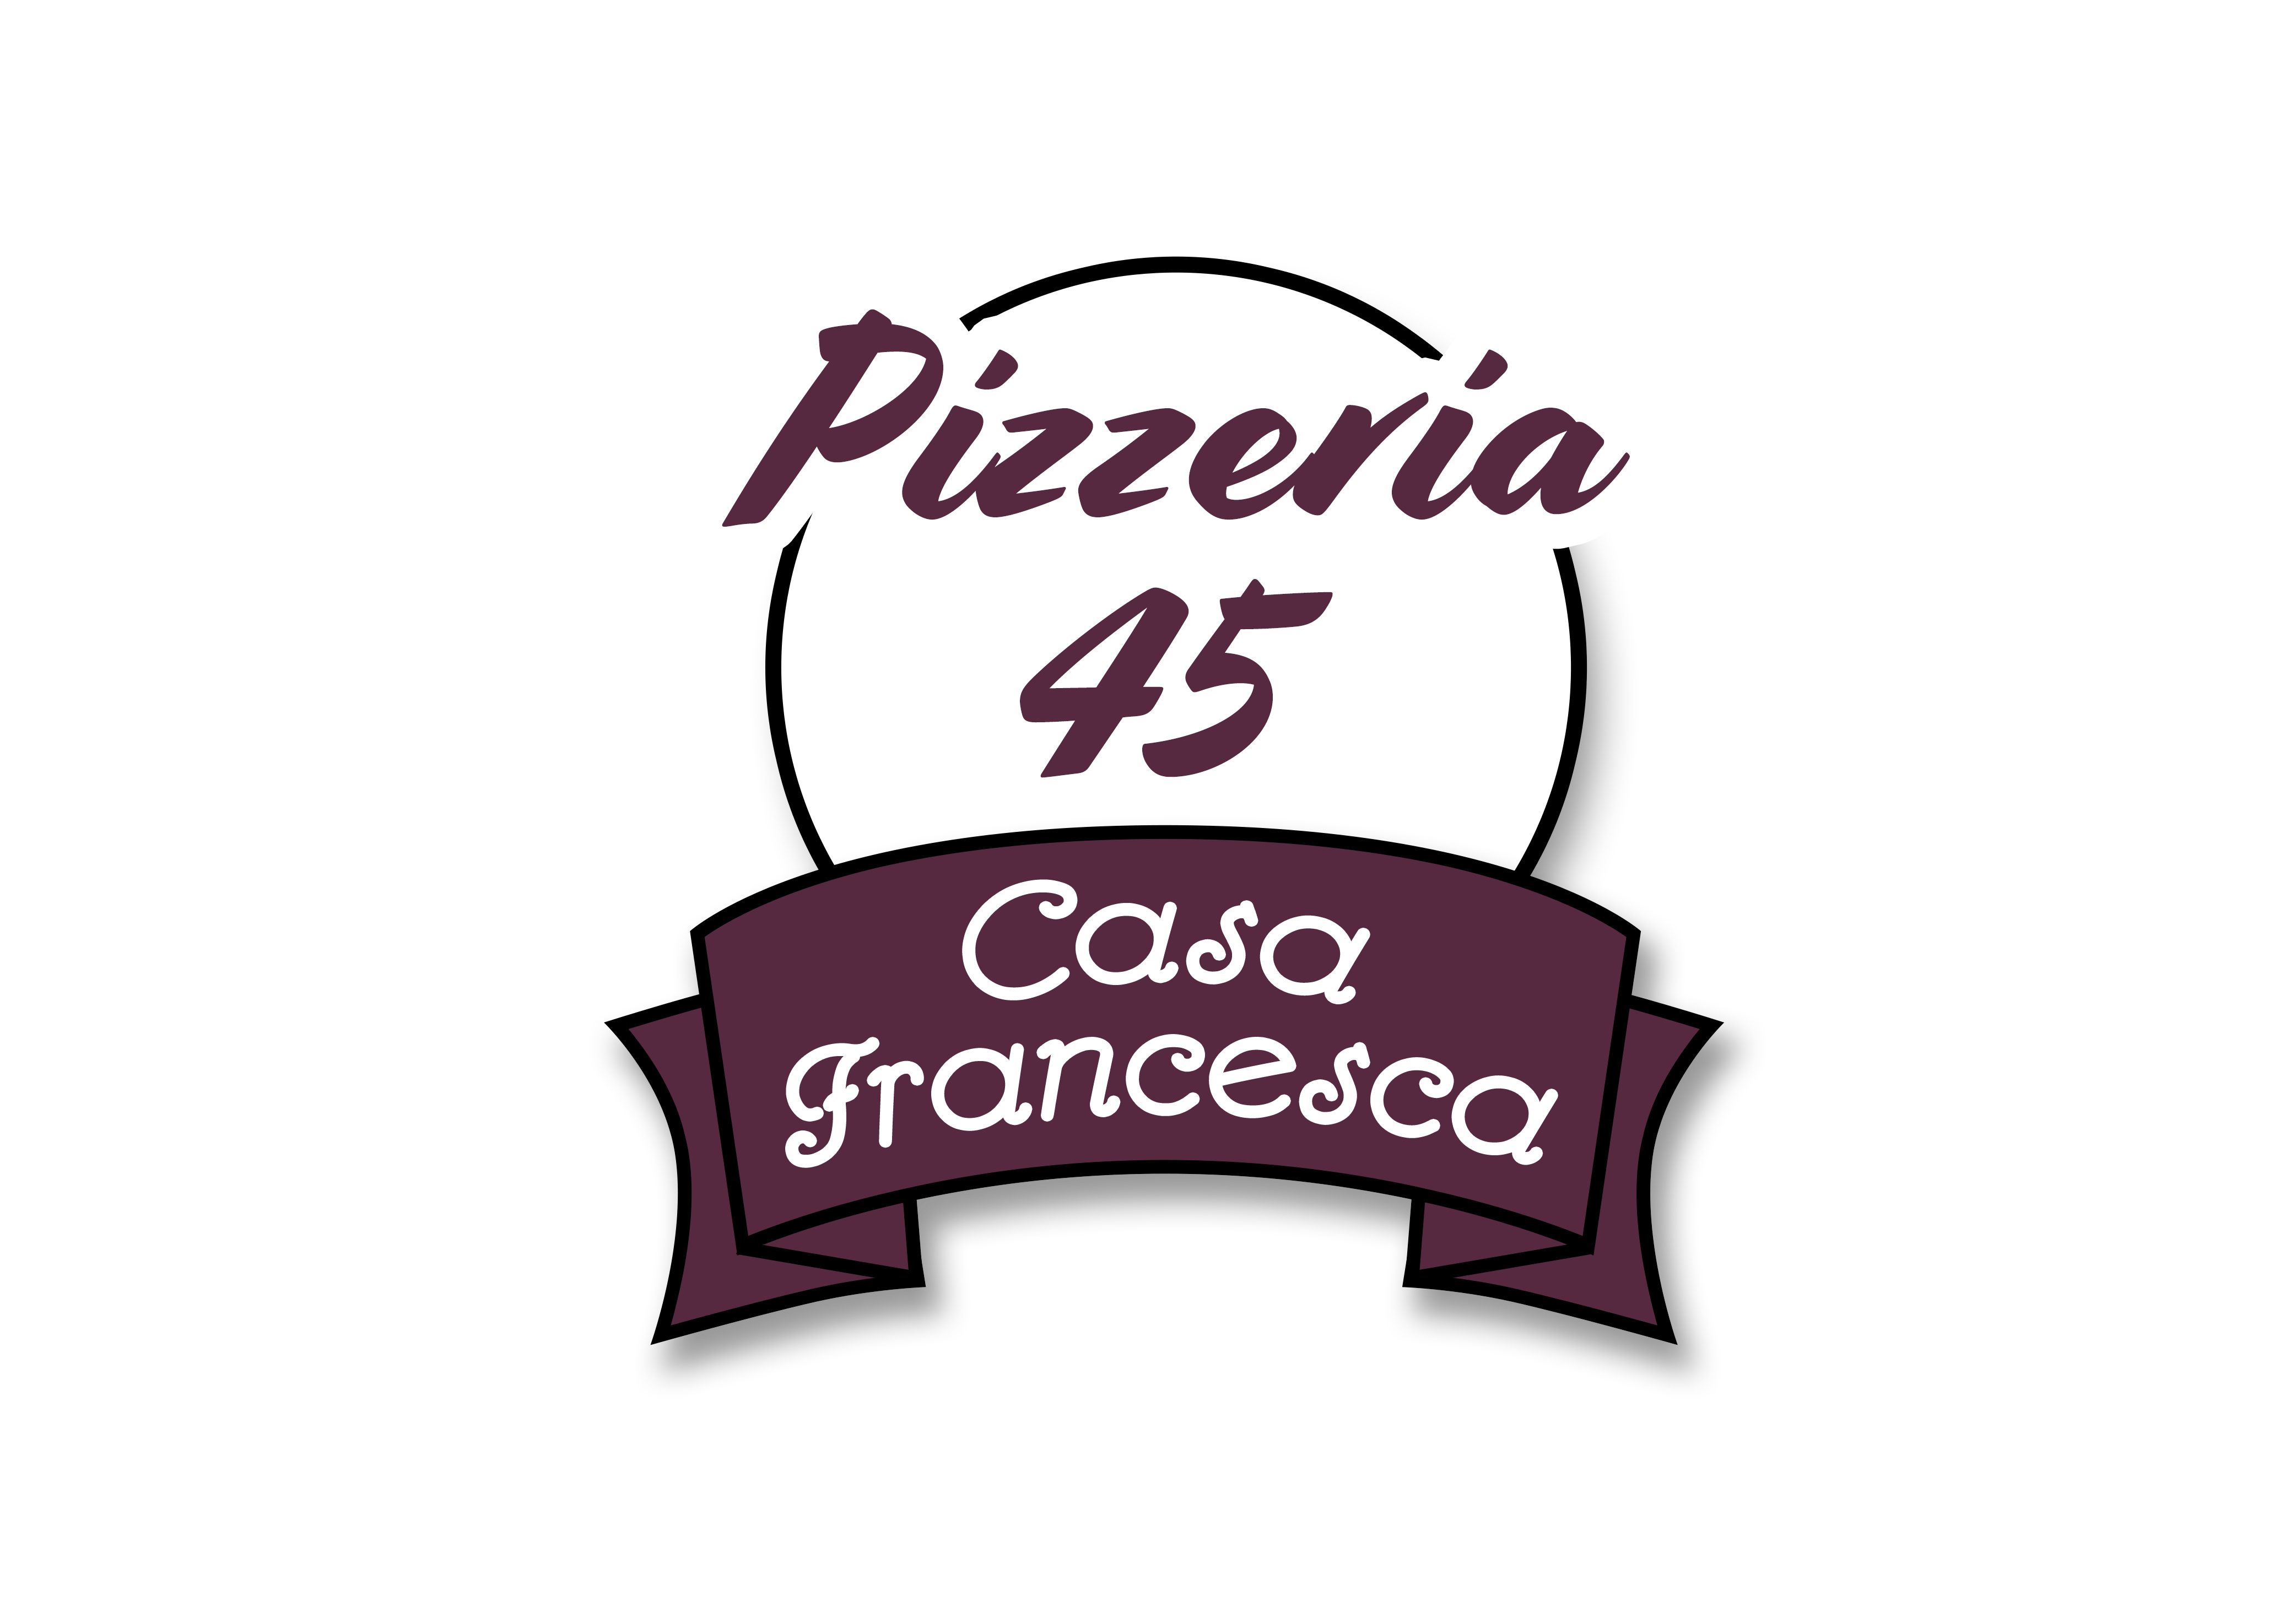 Logo Pizzeria 45 - Casa Francesca